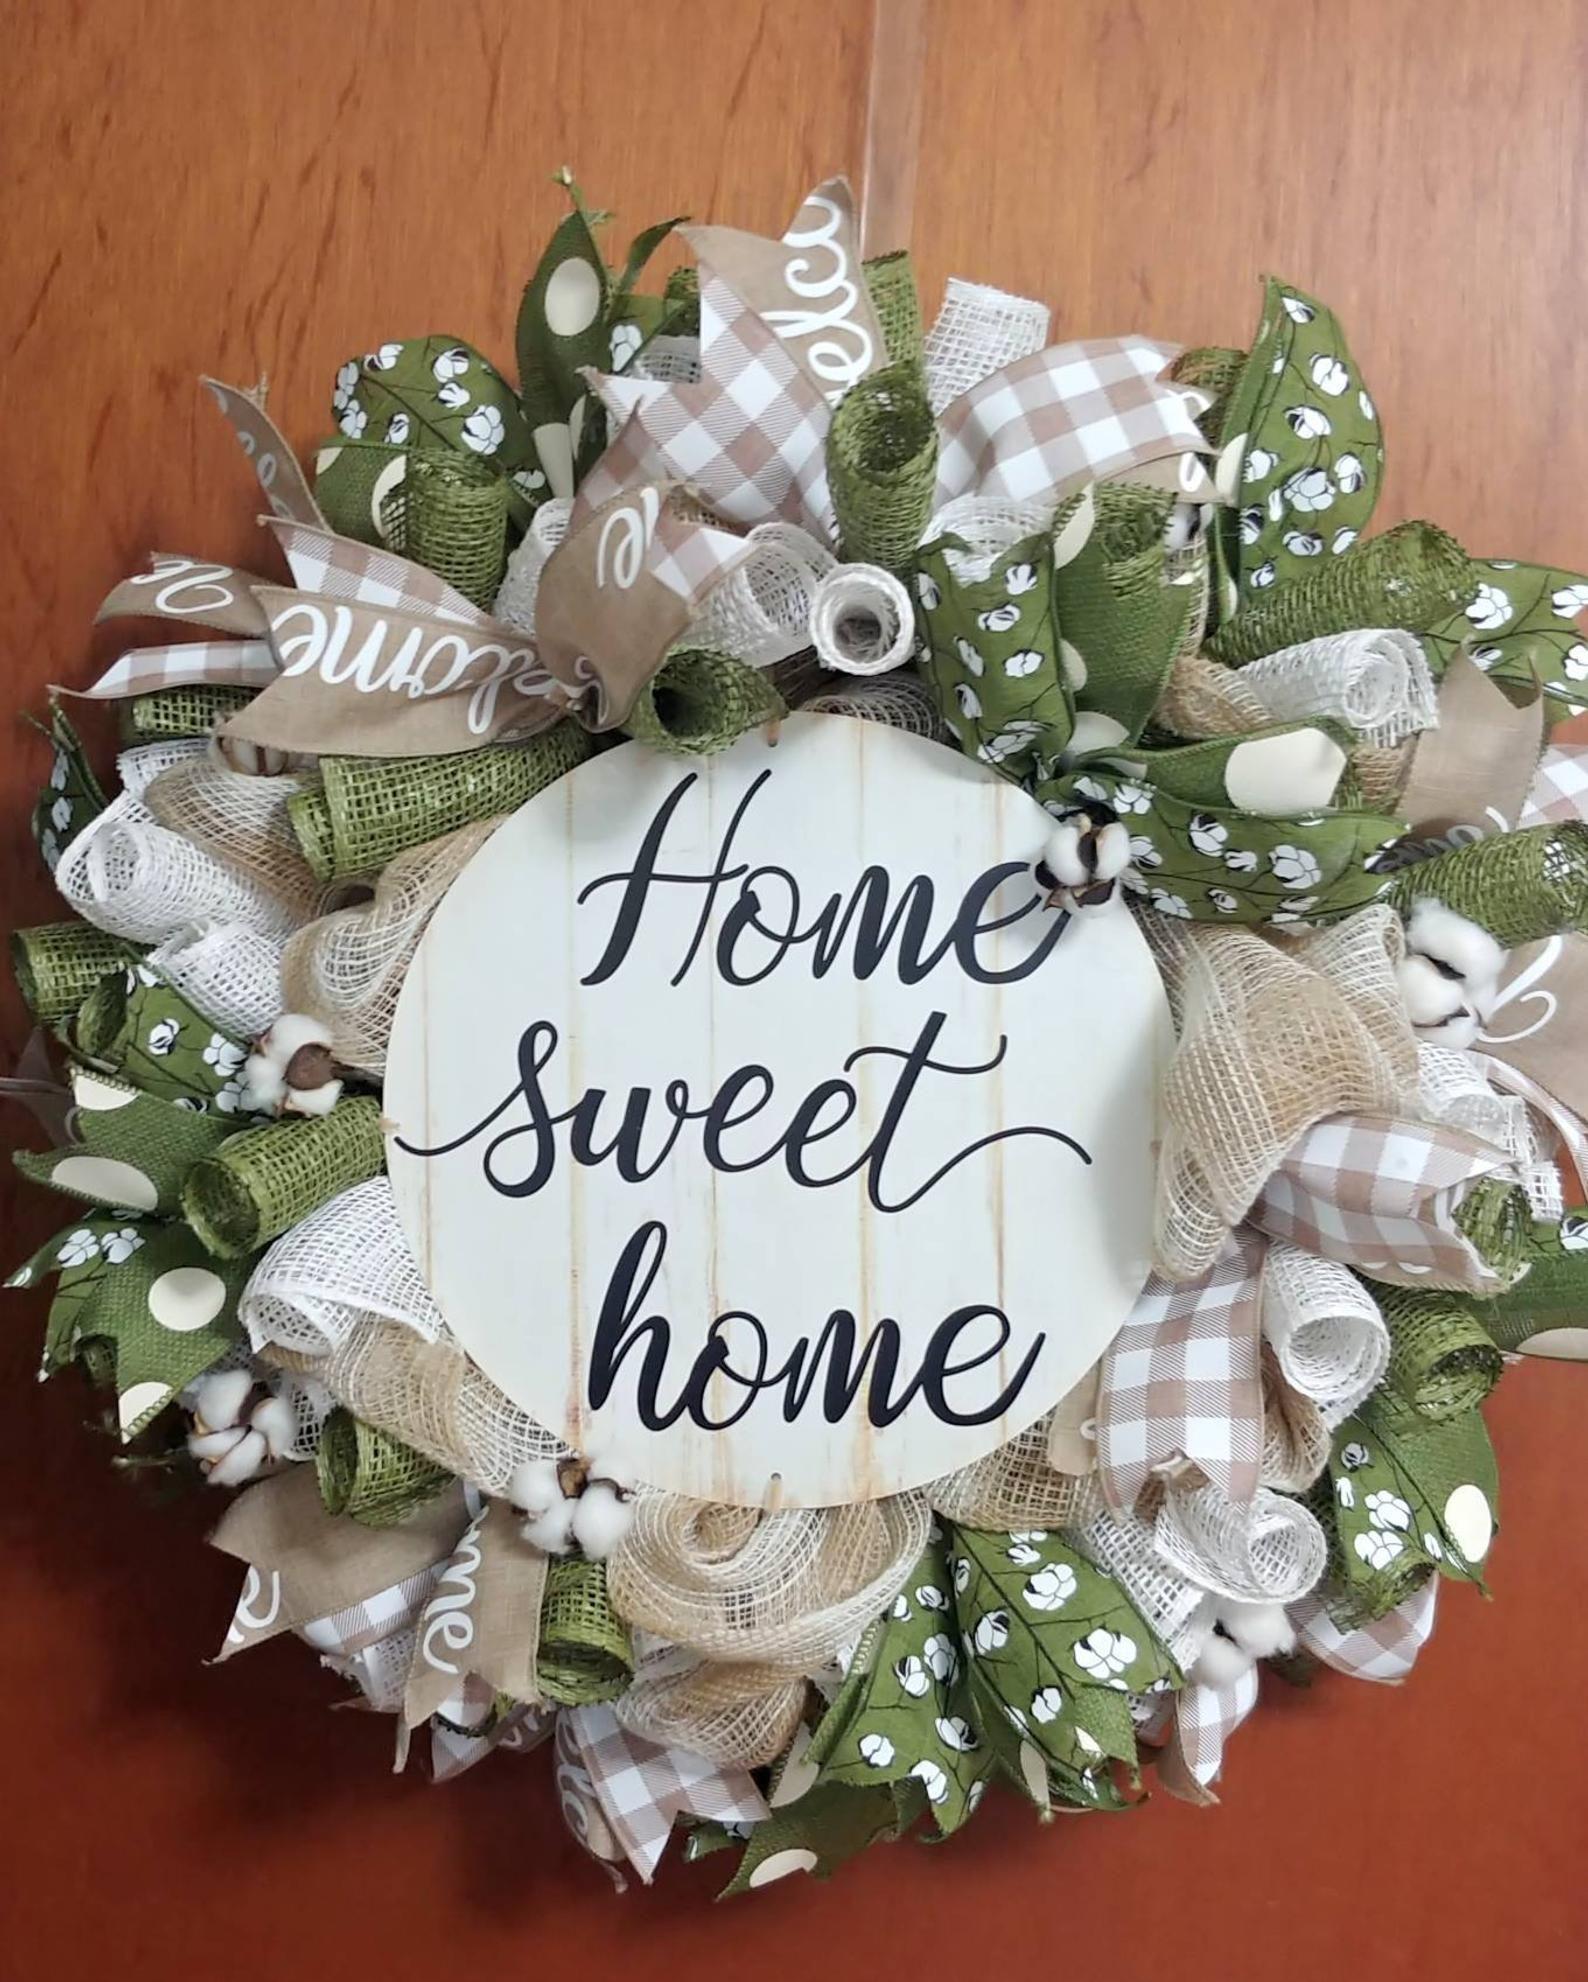 Photo of Home Sweet Home Wreath, Cotton Ball Wreath, , All Season Home Burlap Wreath, Cotton Ball Wreath & Wall Decor, Olive Green,  Cream, Tan Mesh